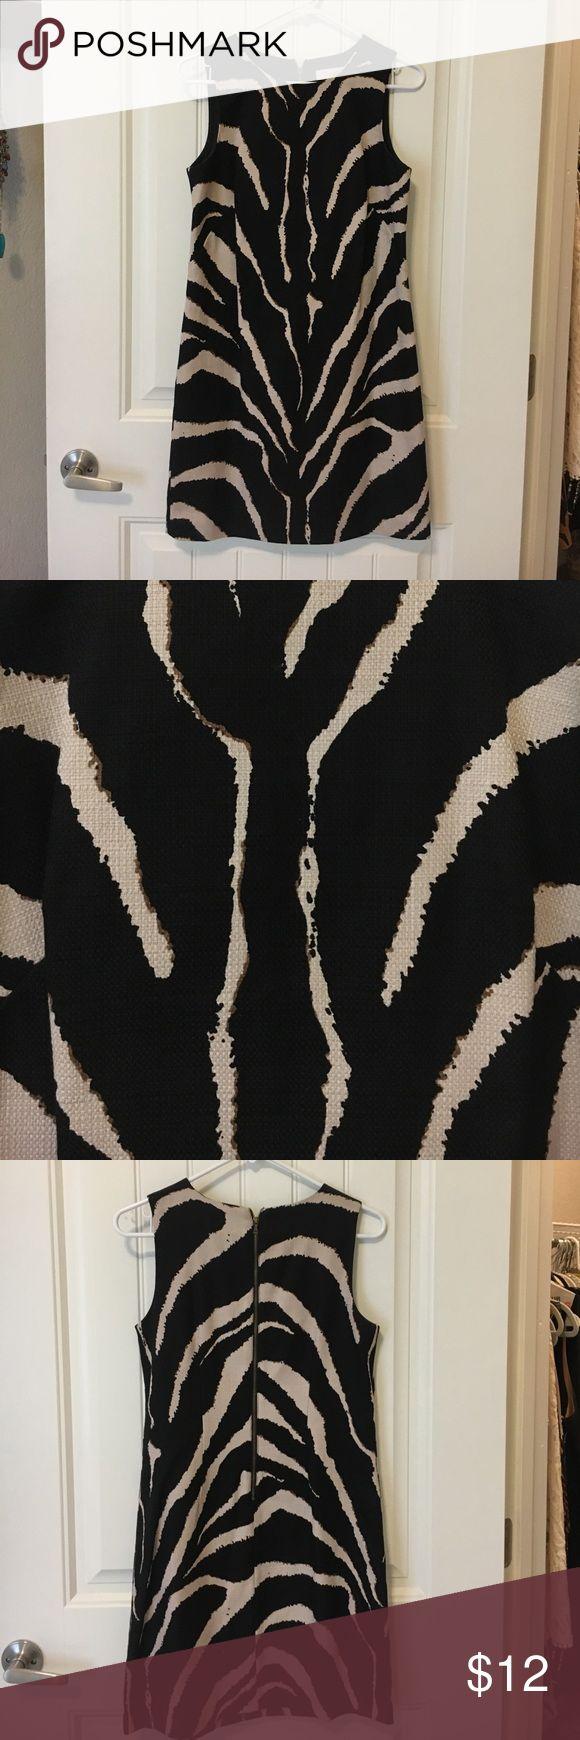 Zebra Print Dress Zebra Print Dress. Never Worn. Great for professional atmosphere. Back zipper. LOFT Dresses Midi